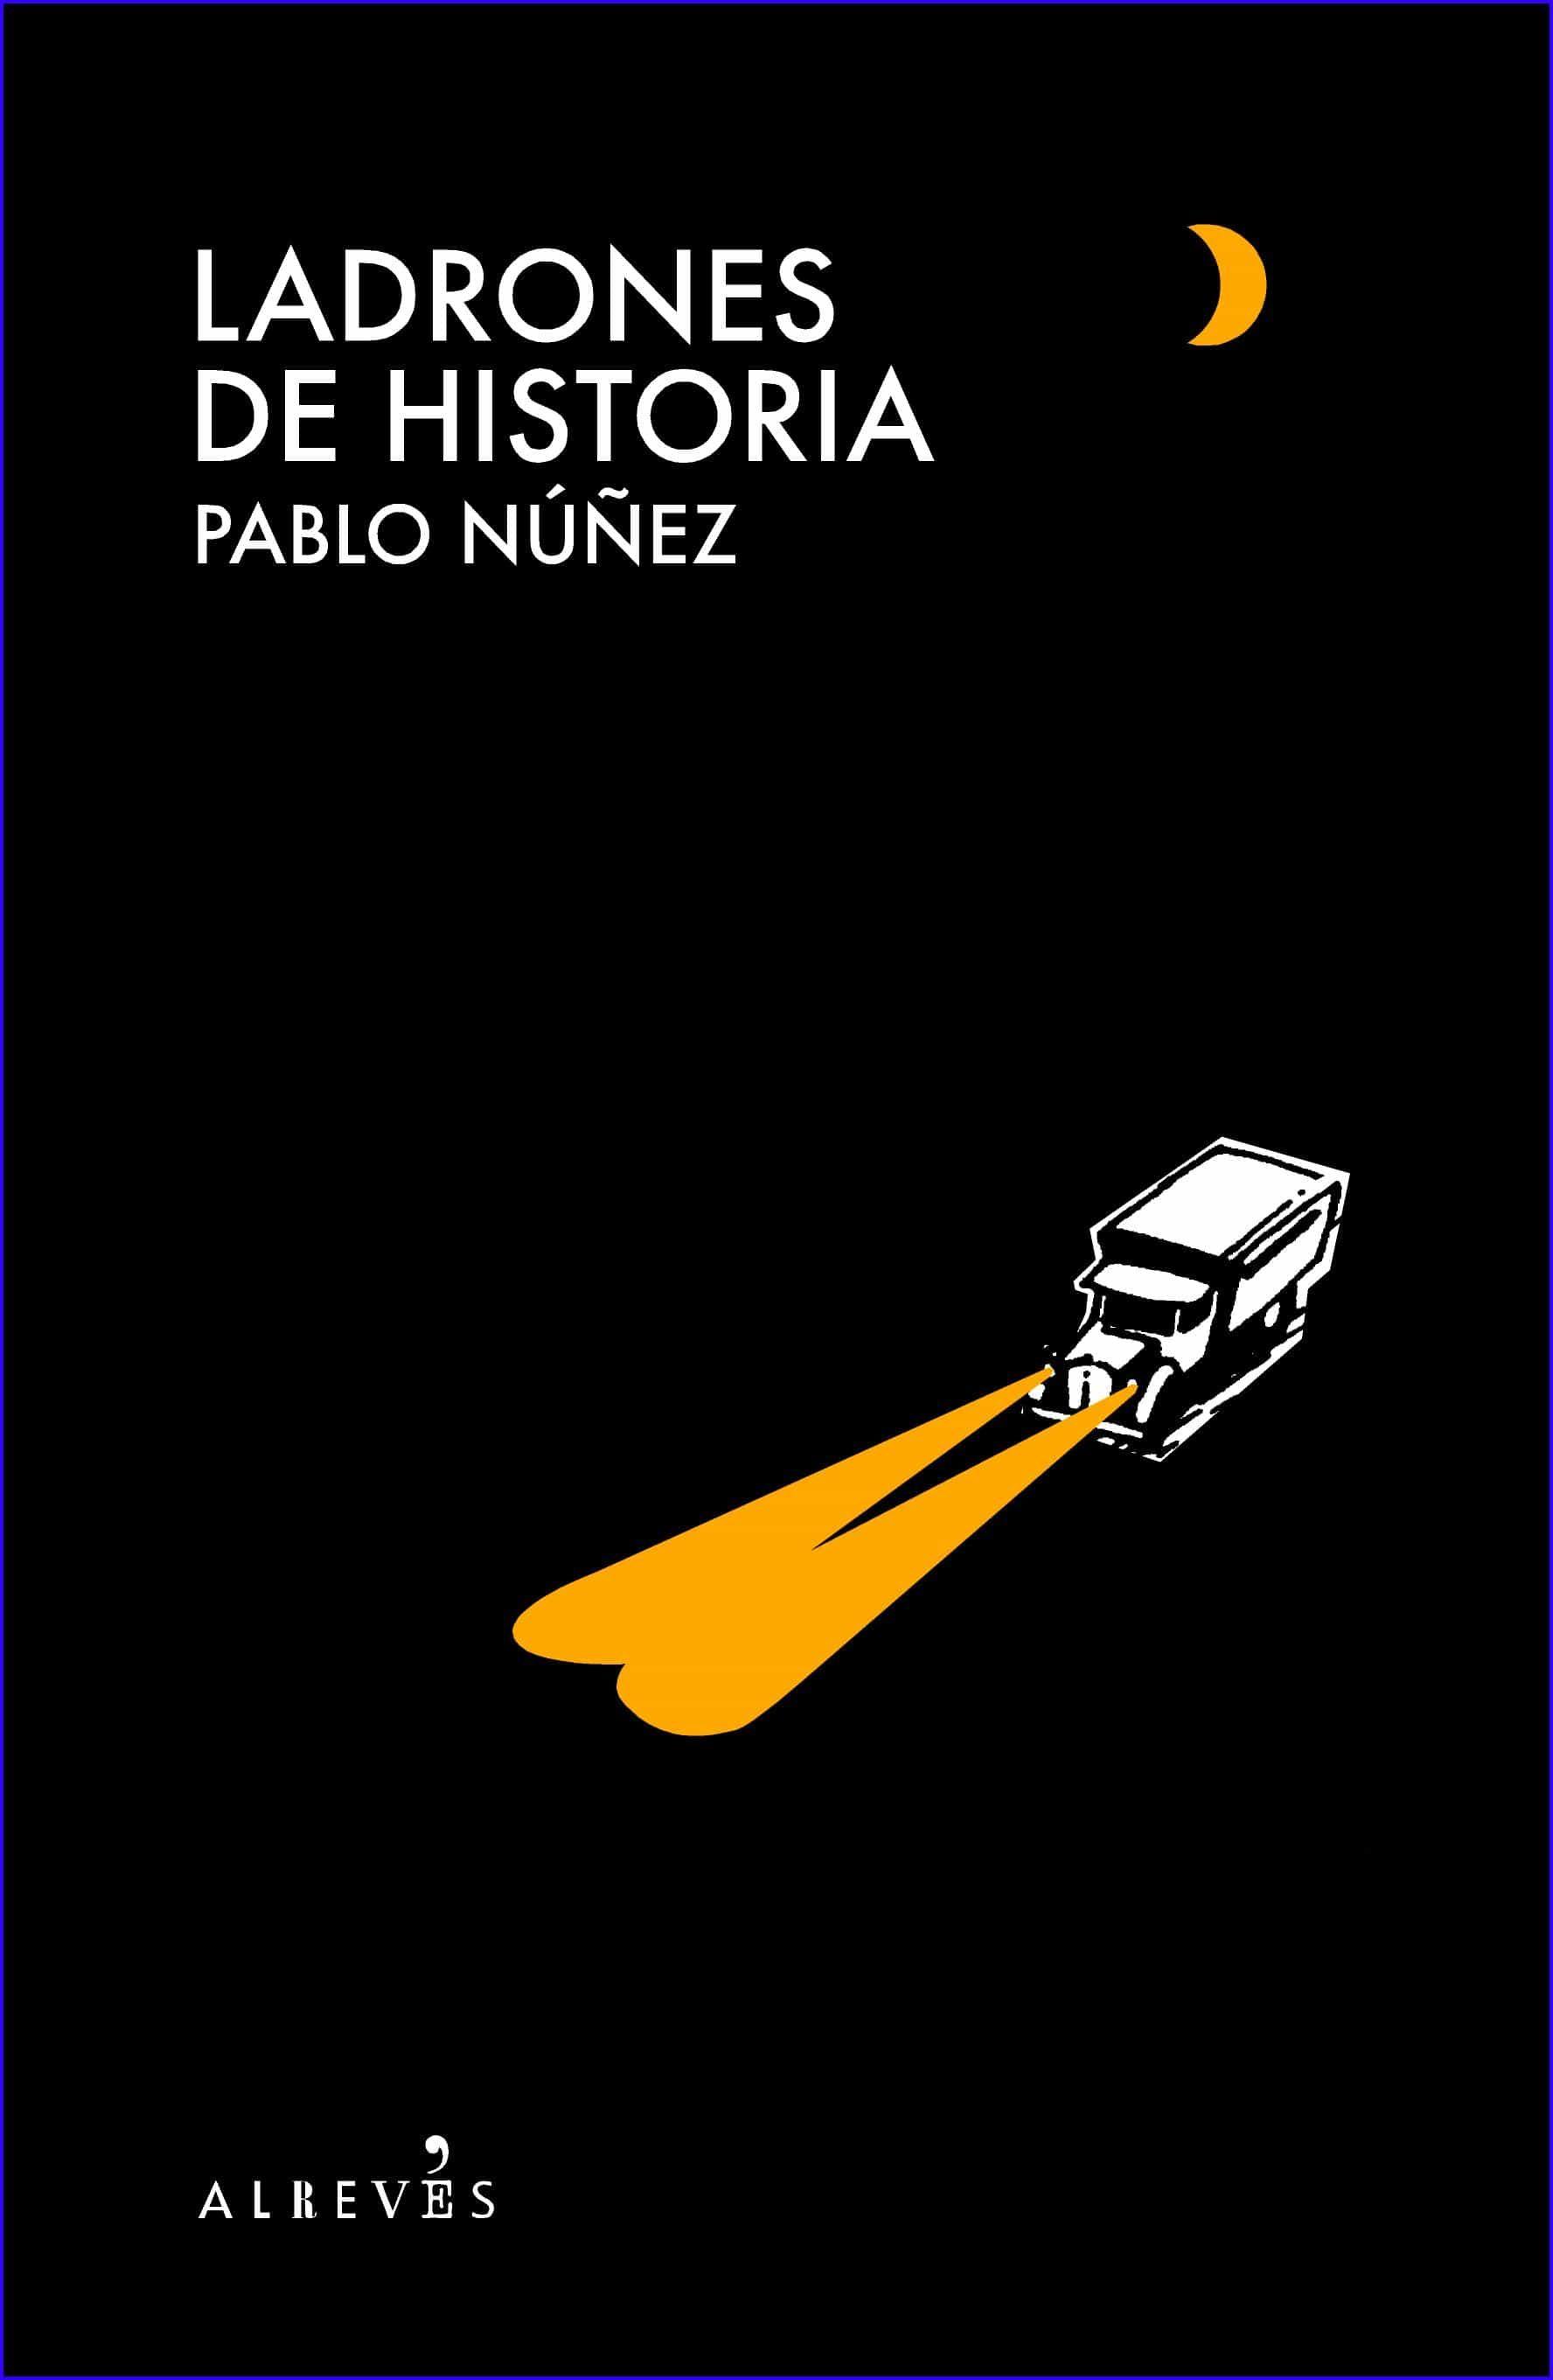 ladrones de historia-pablo nuñez-9788493772864